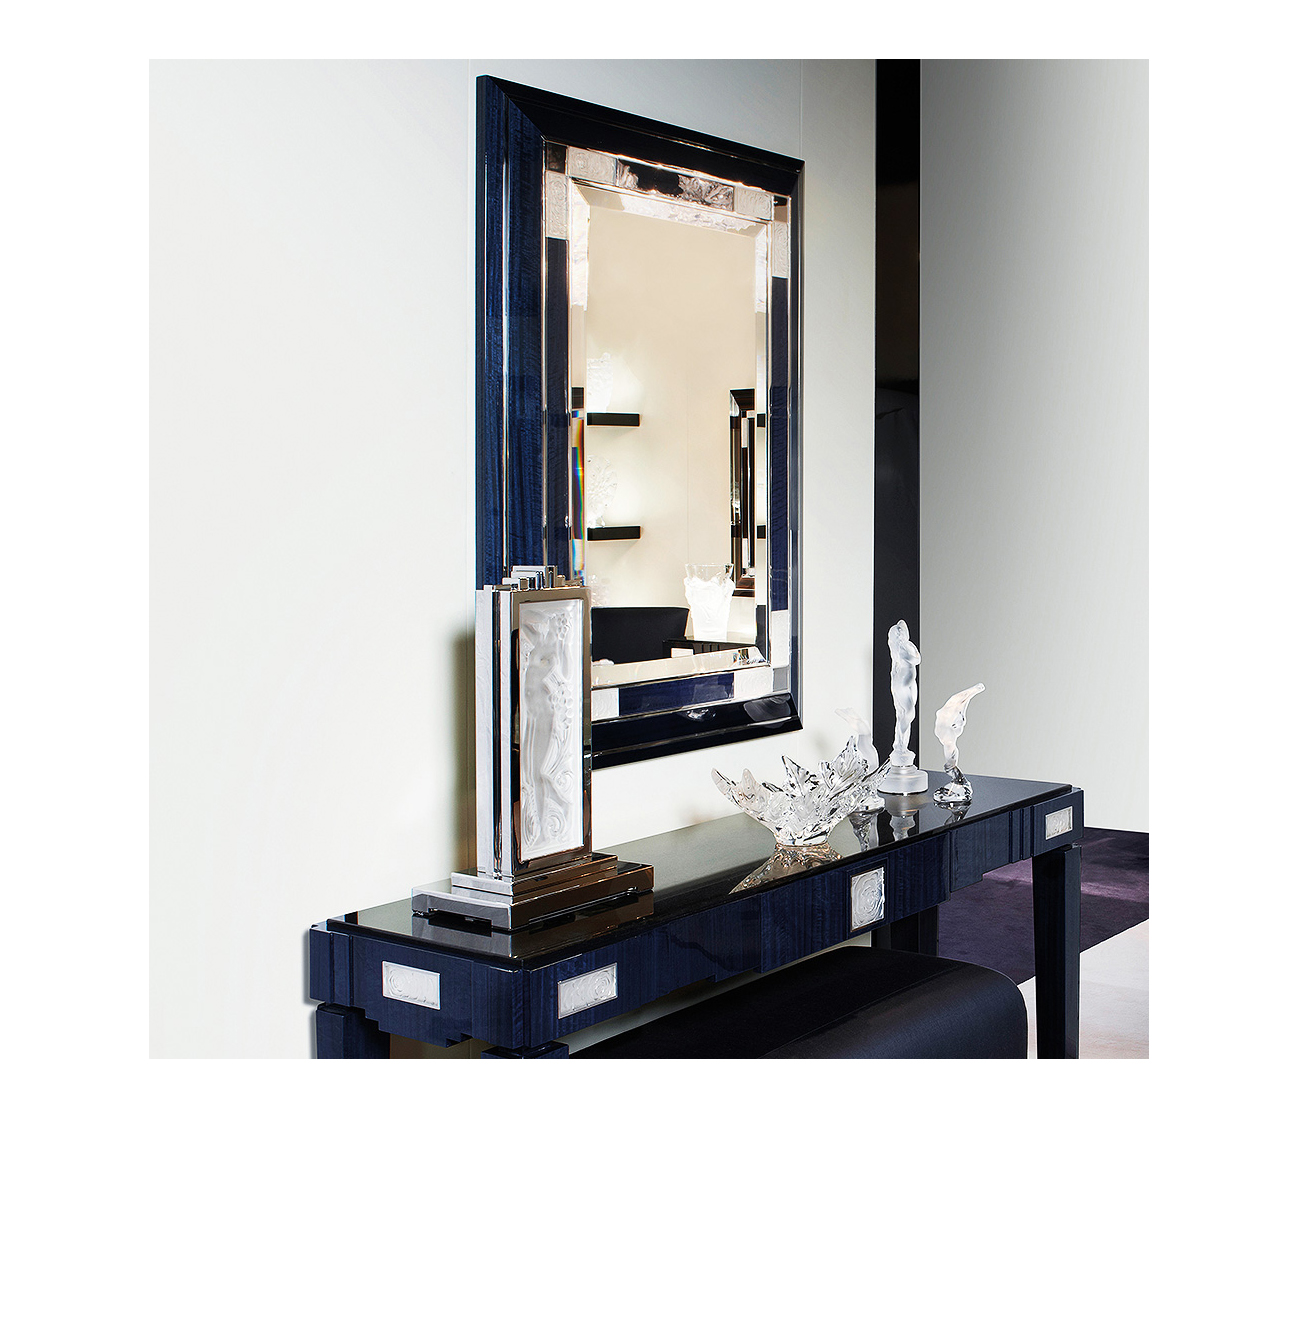 miroir lalique roses 75150000. Black Bedroom Furniture Sets. Home Design Ideas